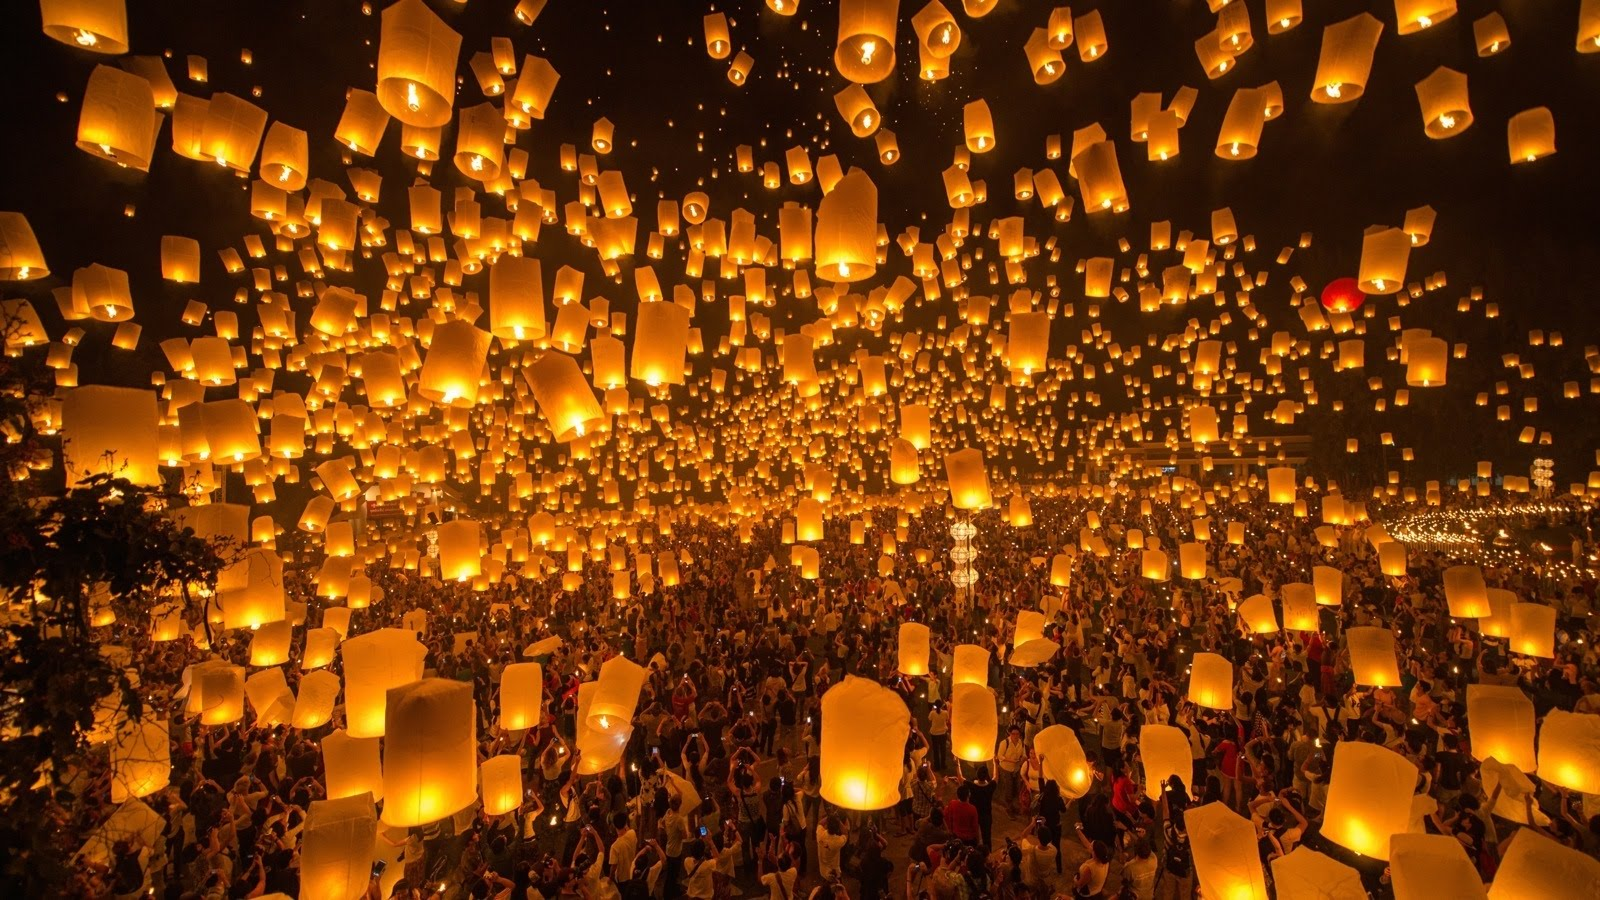 taiwan lantern festival 2018 2 Image credit: taiwan lantern festival 2018 dates blog.